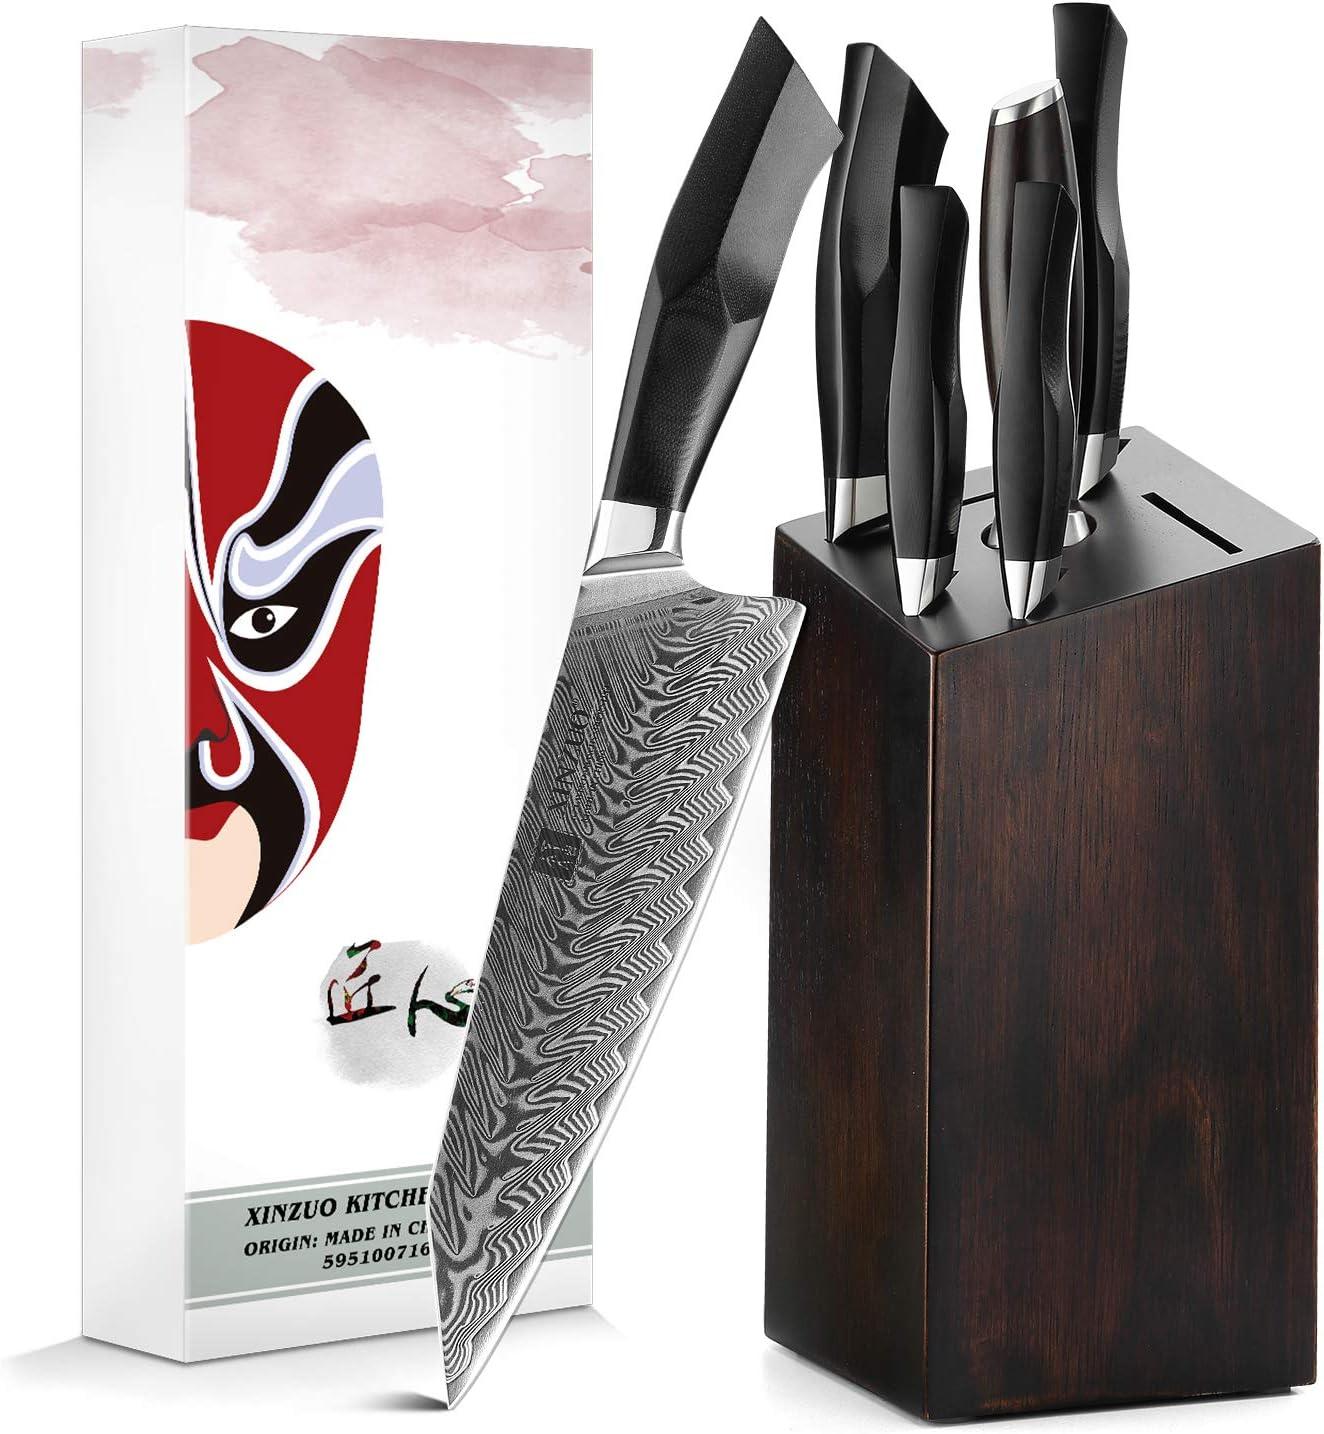 XINZUO Damascus 販売期間 限定のお得なタイムセール Steel 7-Piece Kitchen Knife Block Woode with ファッション通販 Set